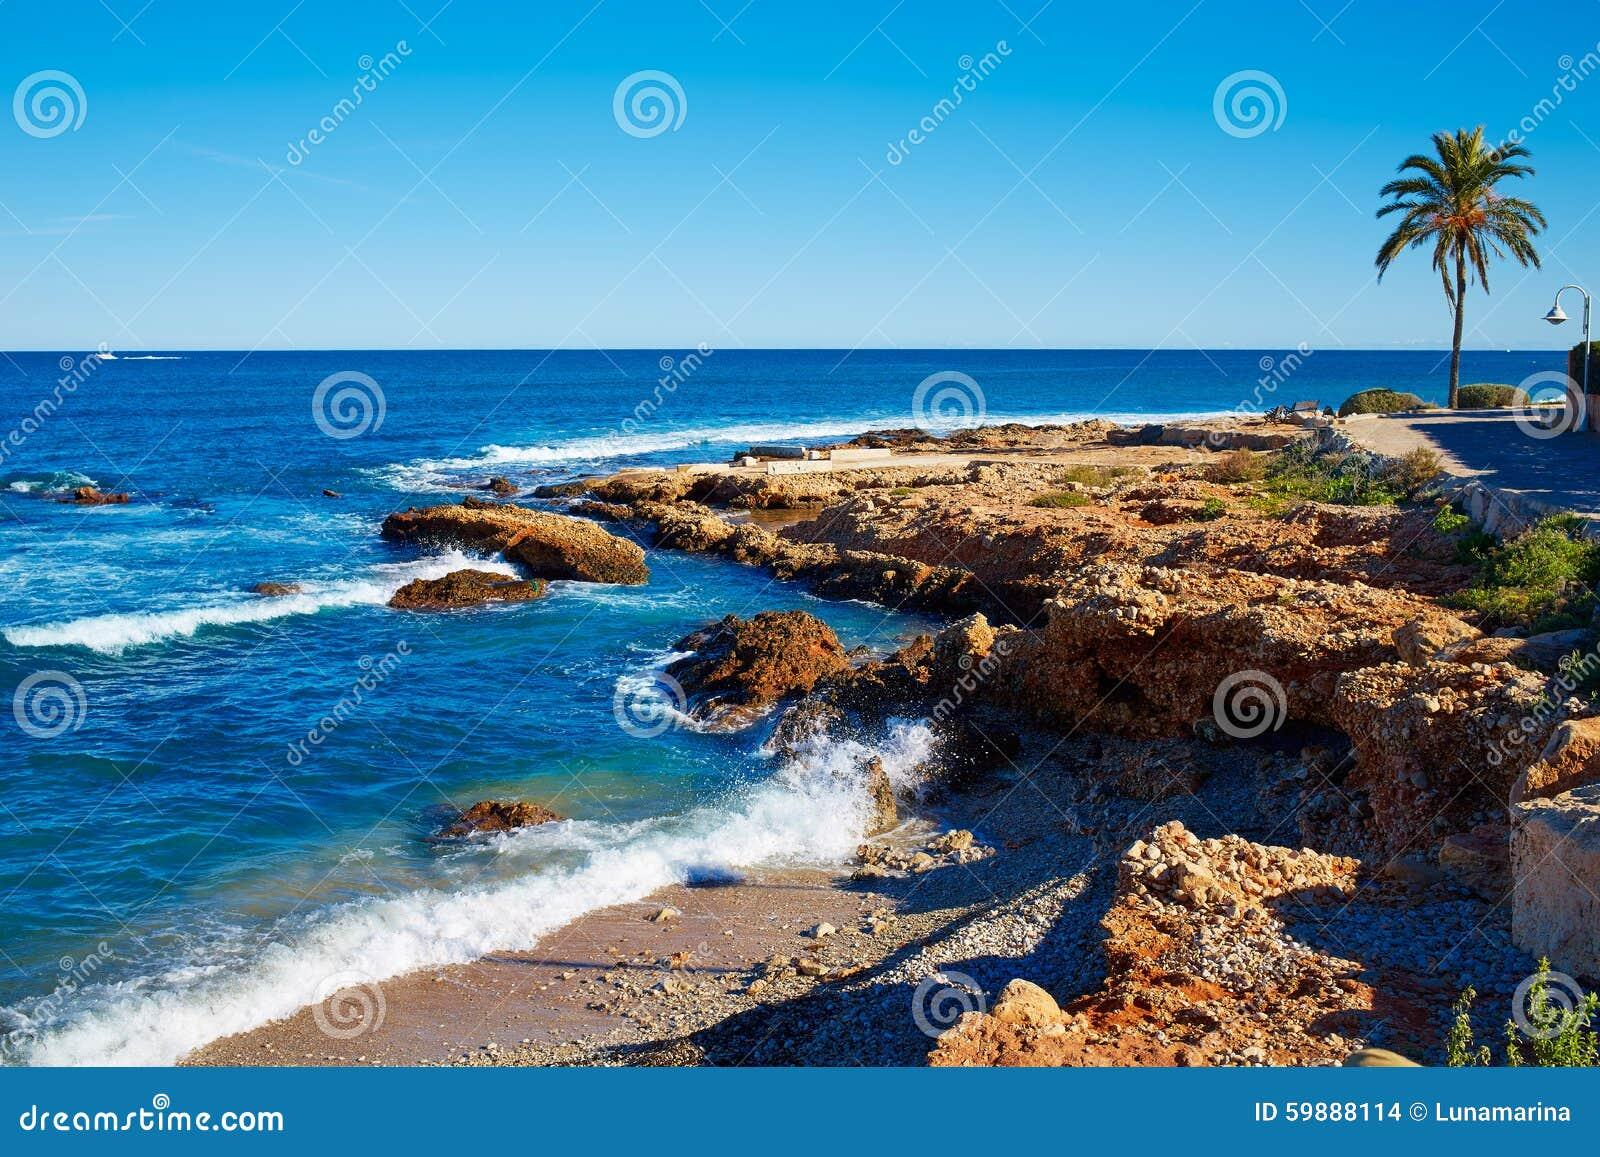 denia las rotas rotes beach in alicante mediterranean stock photo